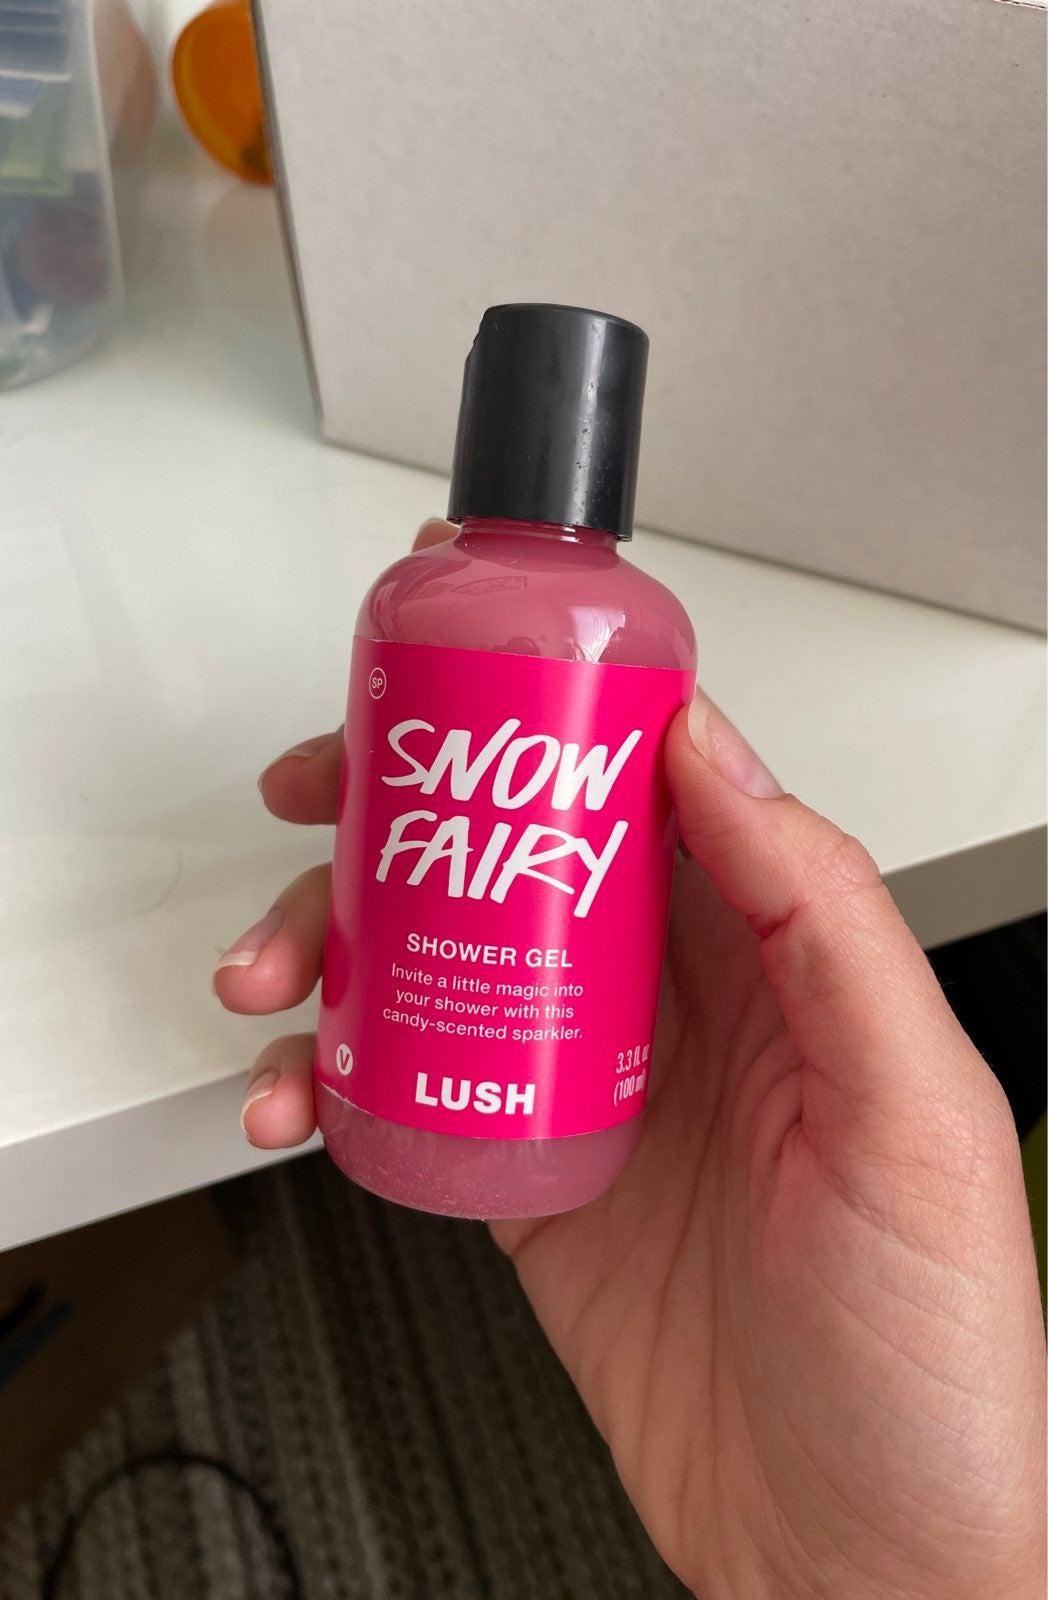 Lush Snow Fairy Shower Gel 3.3oz